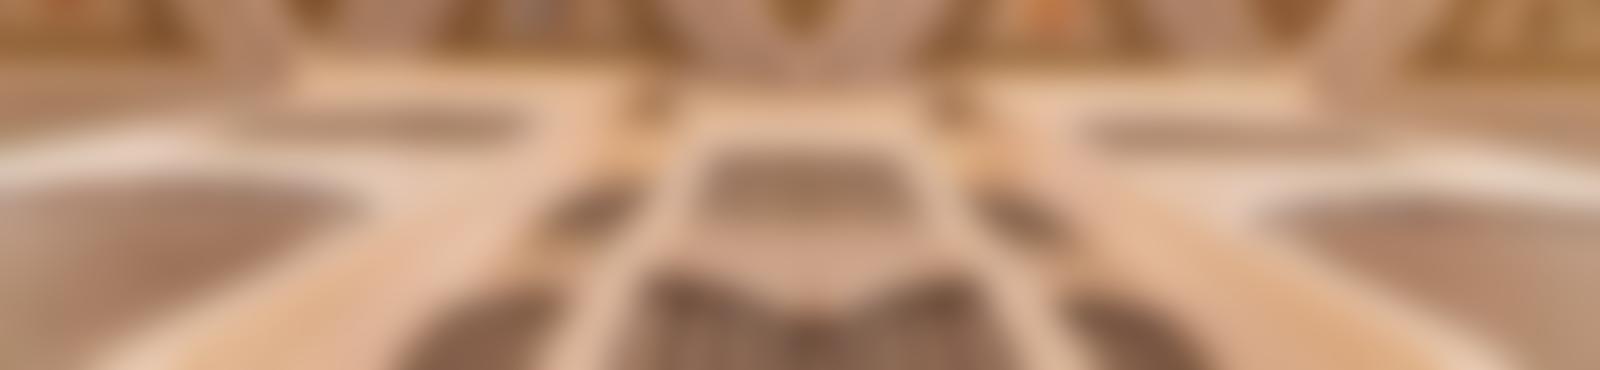 Blurred 3af81713 91be 4bf6 b0e3 d9d4a6813547